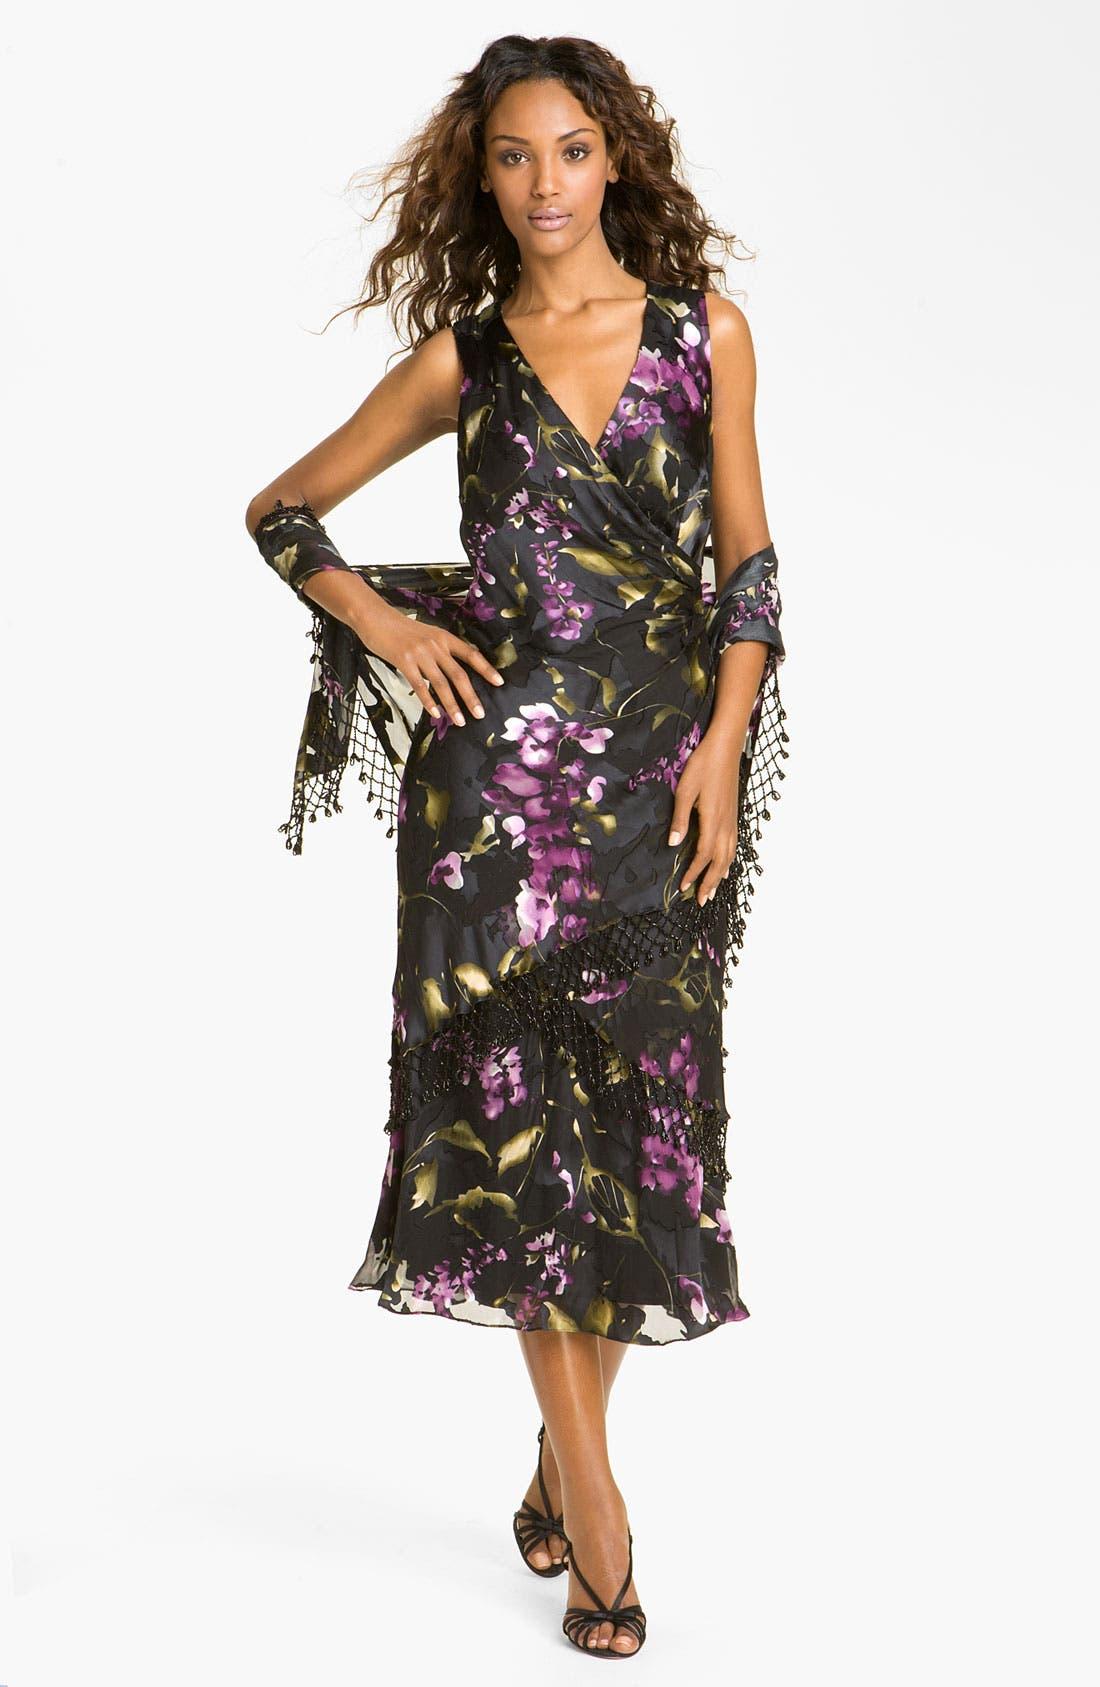 Main Image - Alex Evenings Floral Print Mixed Media Dress & Fringed Shawl